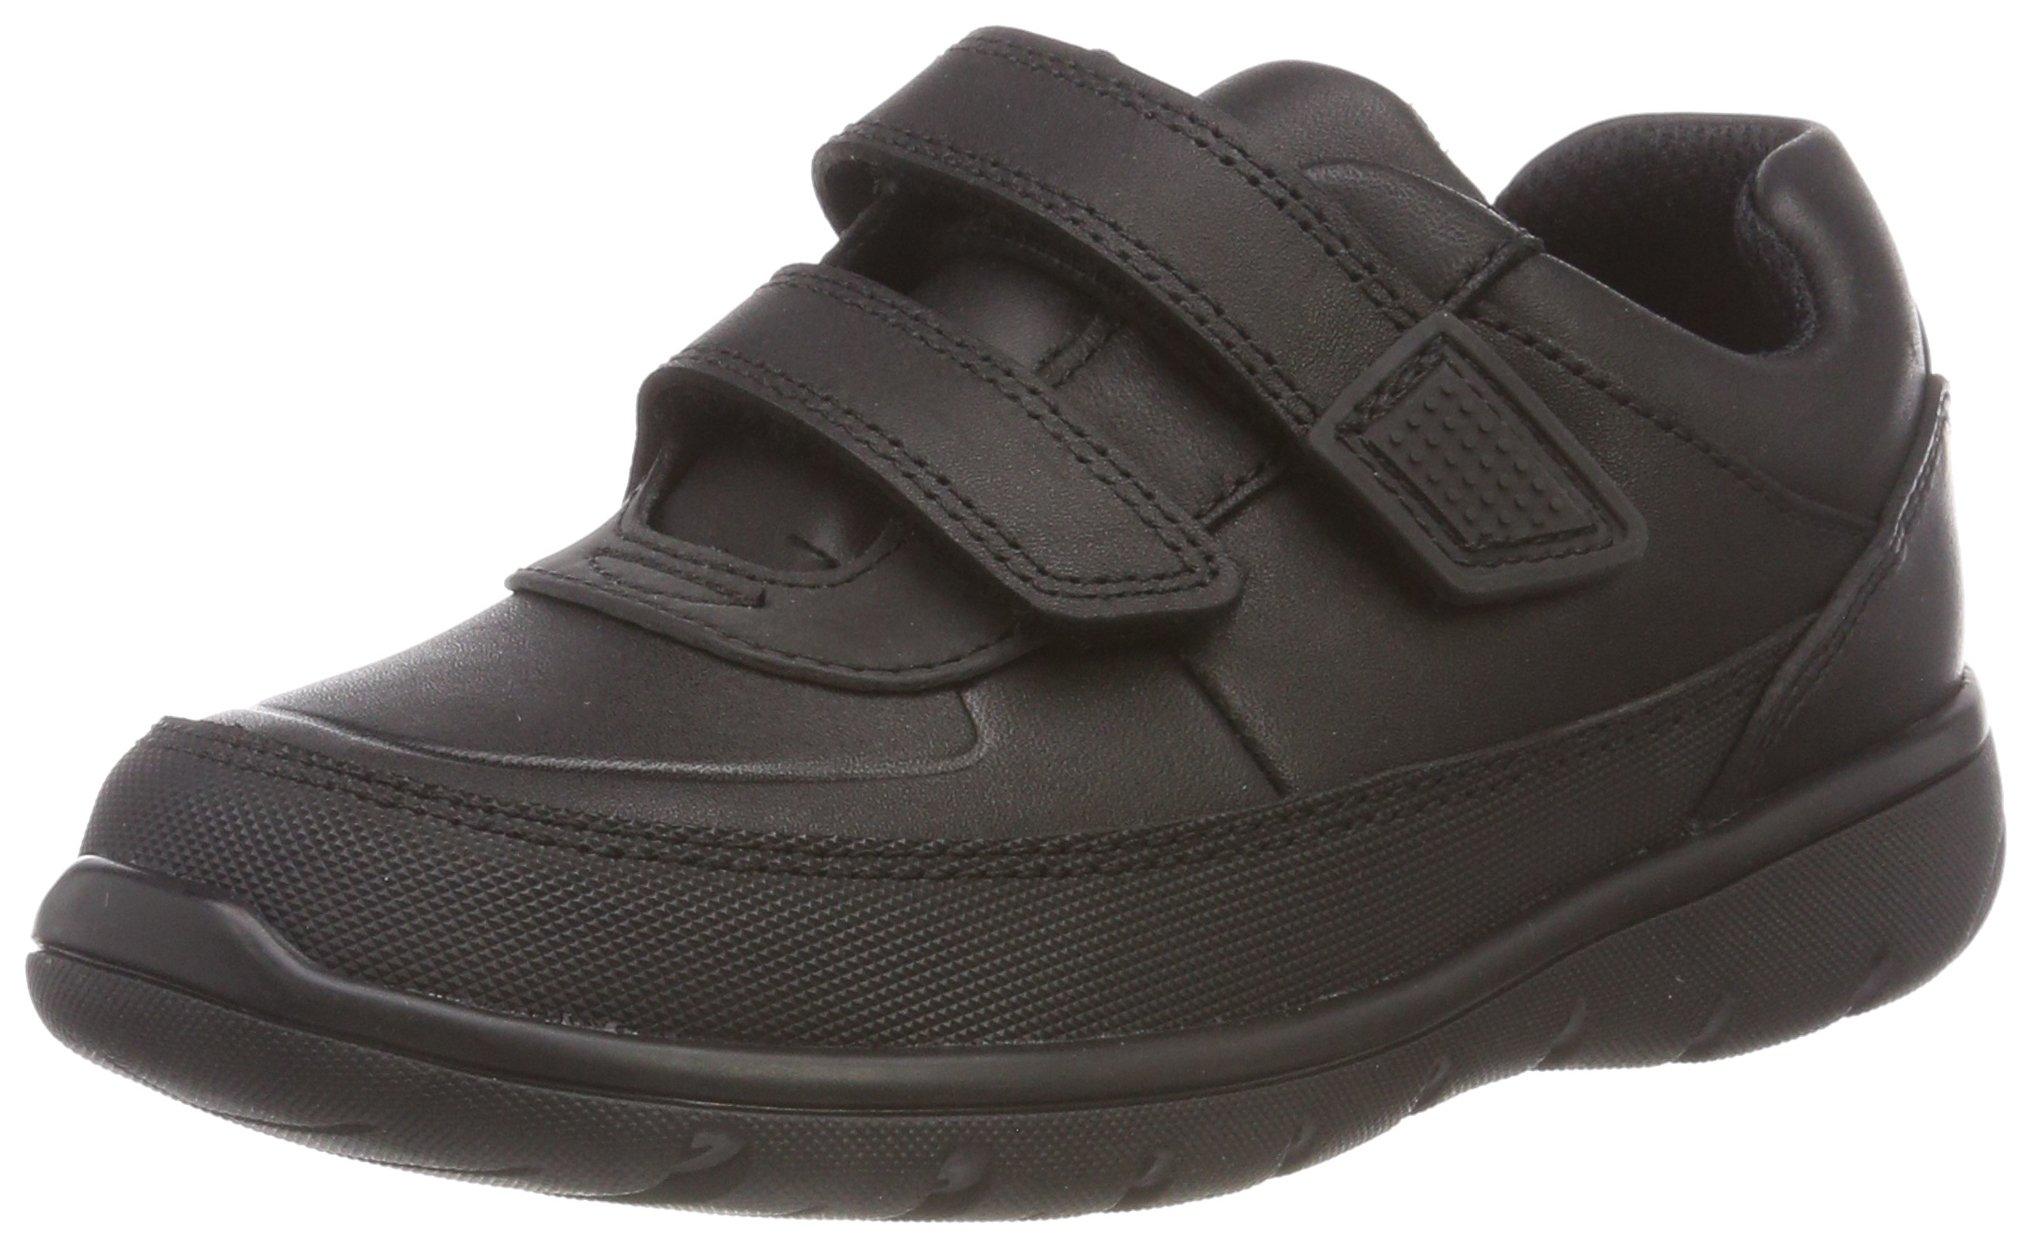 CLARKS Boys' Venture Walk Derbys, Black (Black Leather-), 1 UK